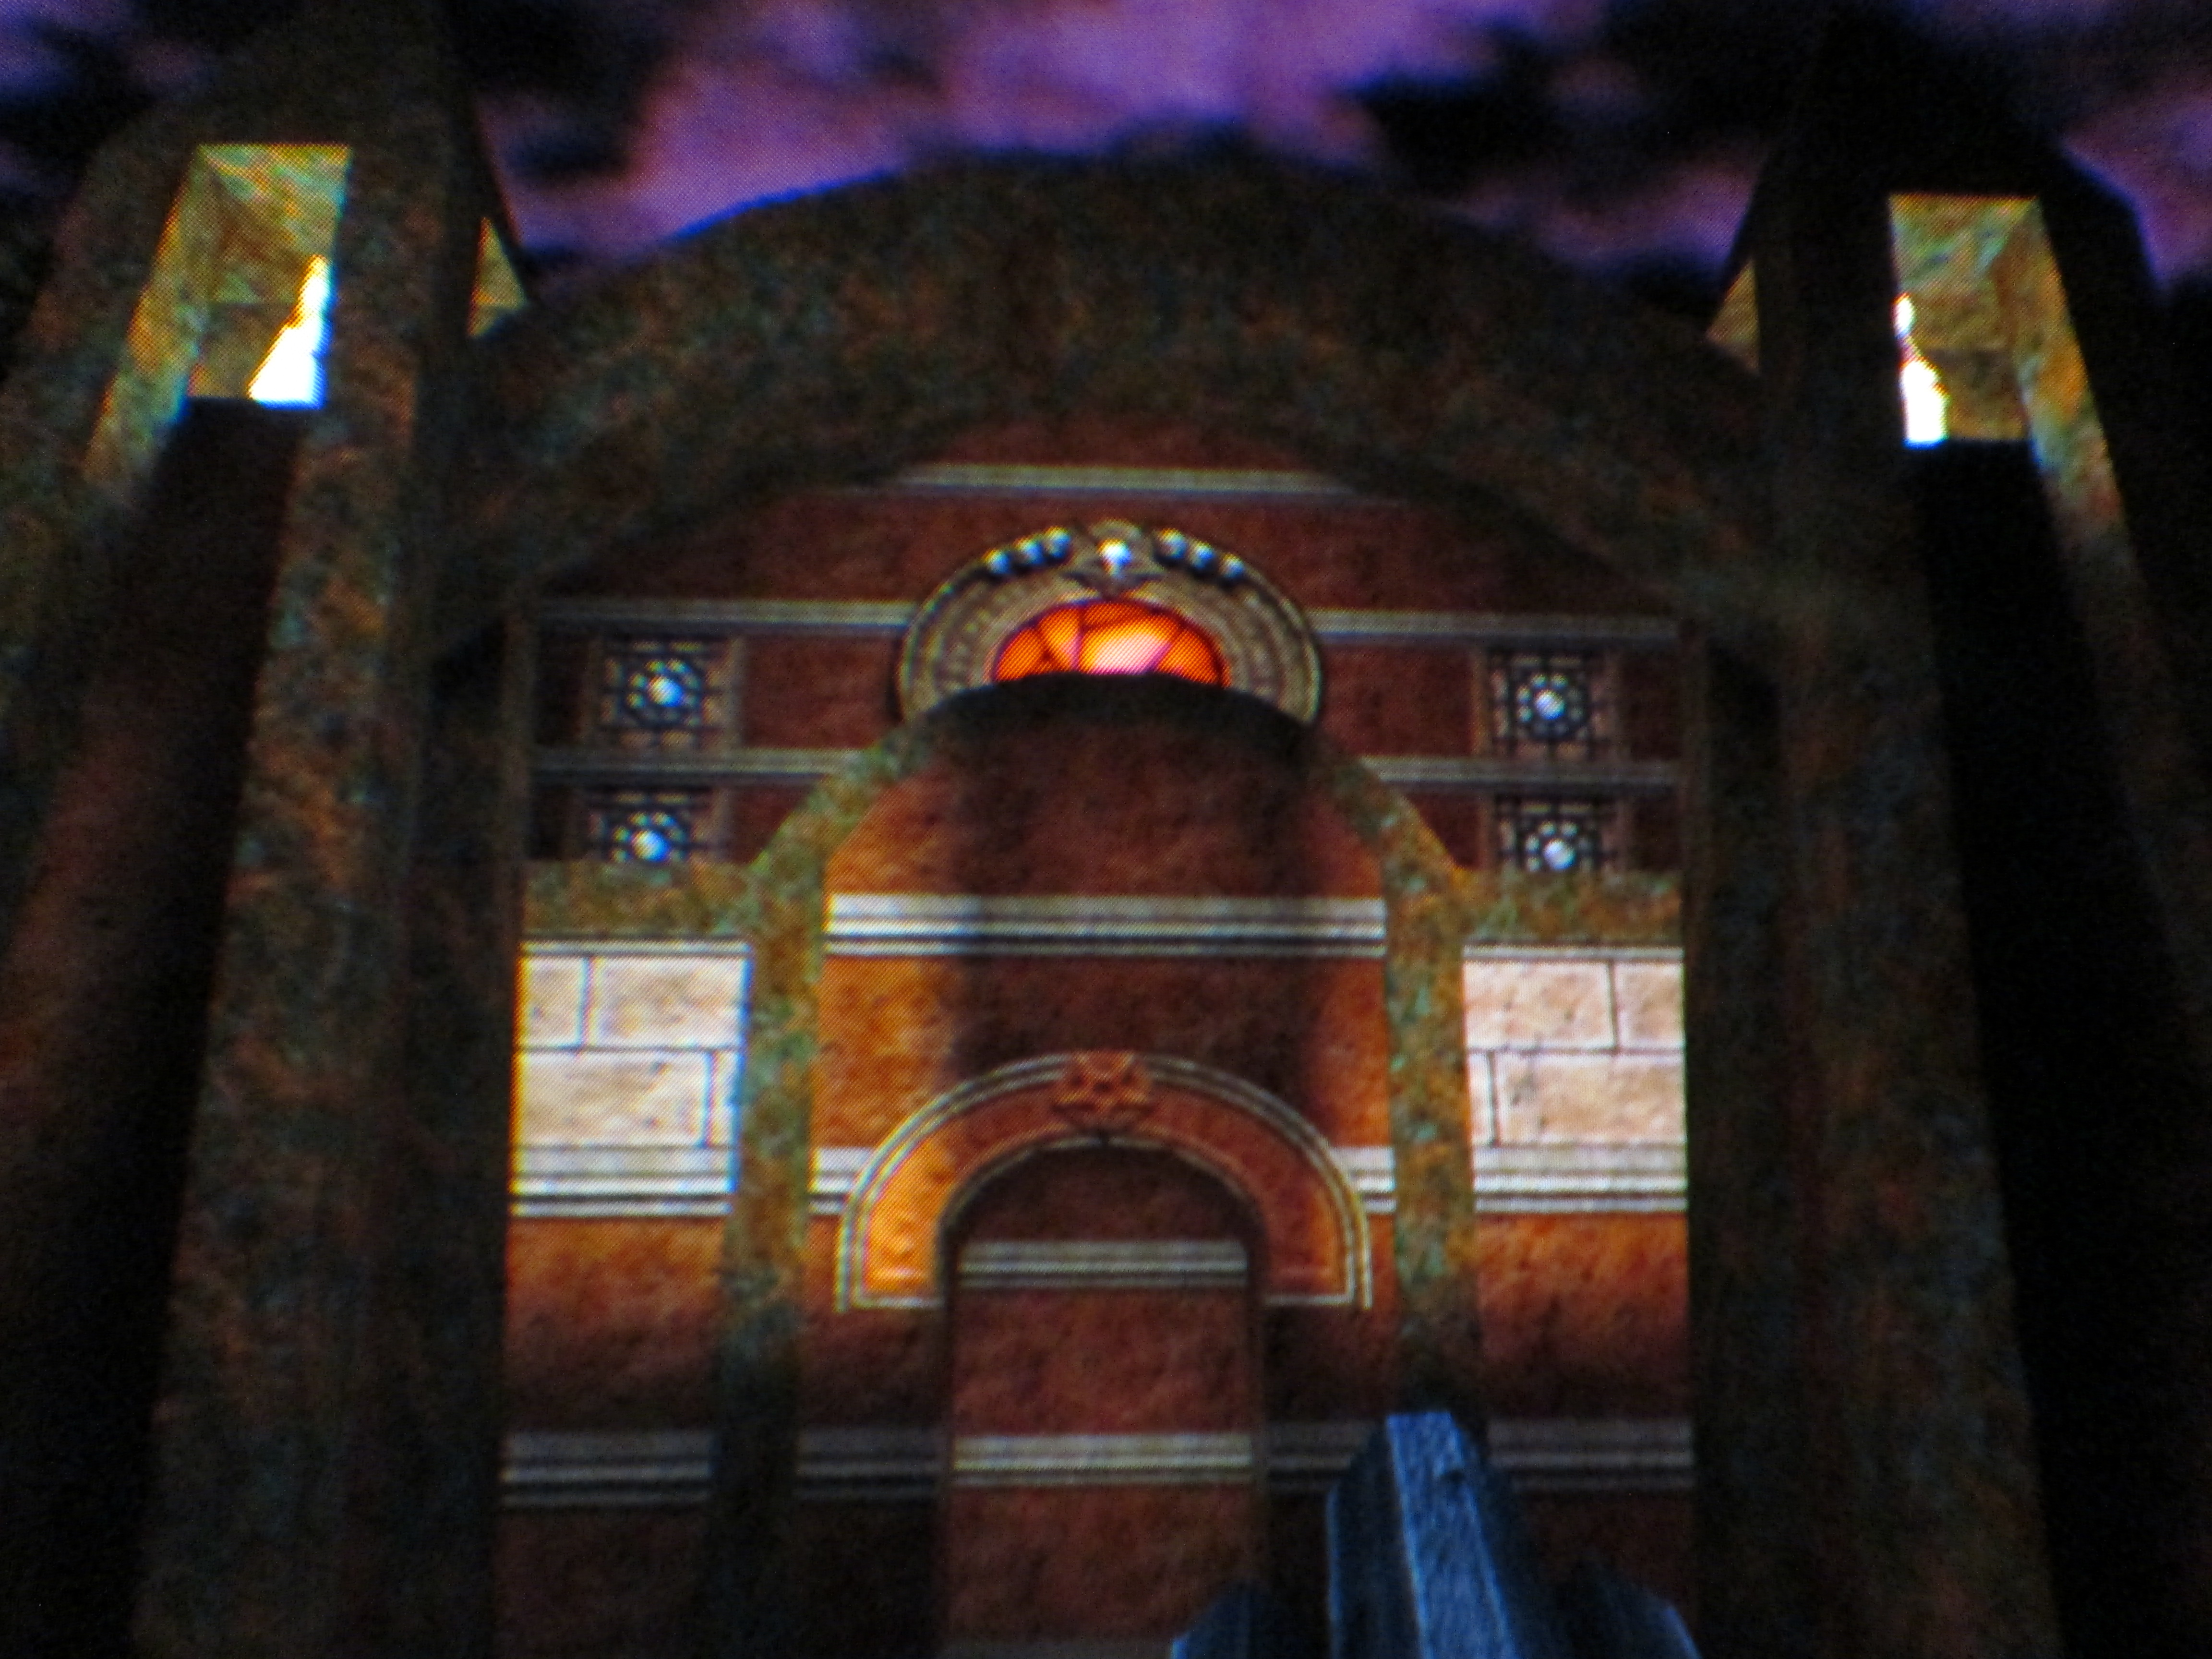 Quake Gear VR FOV Image